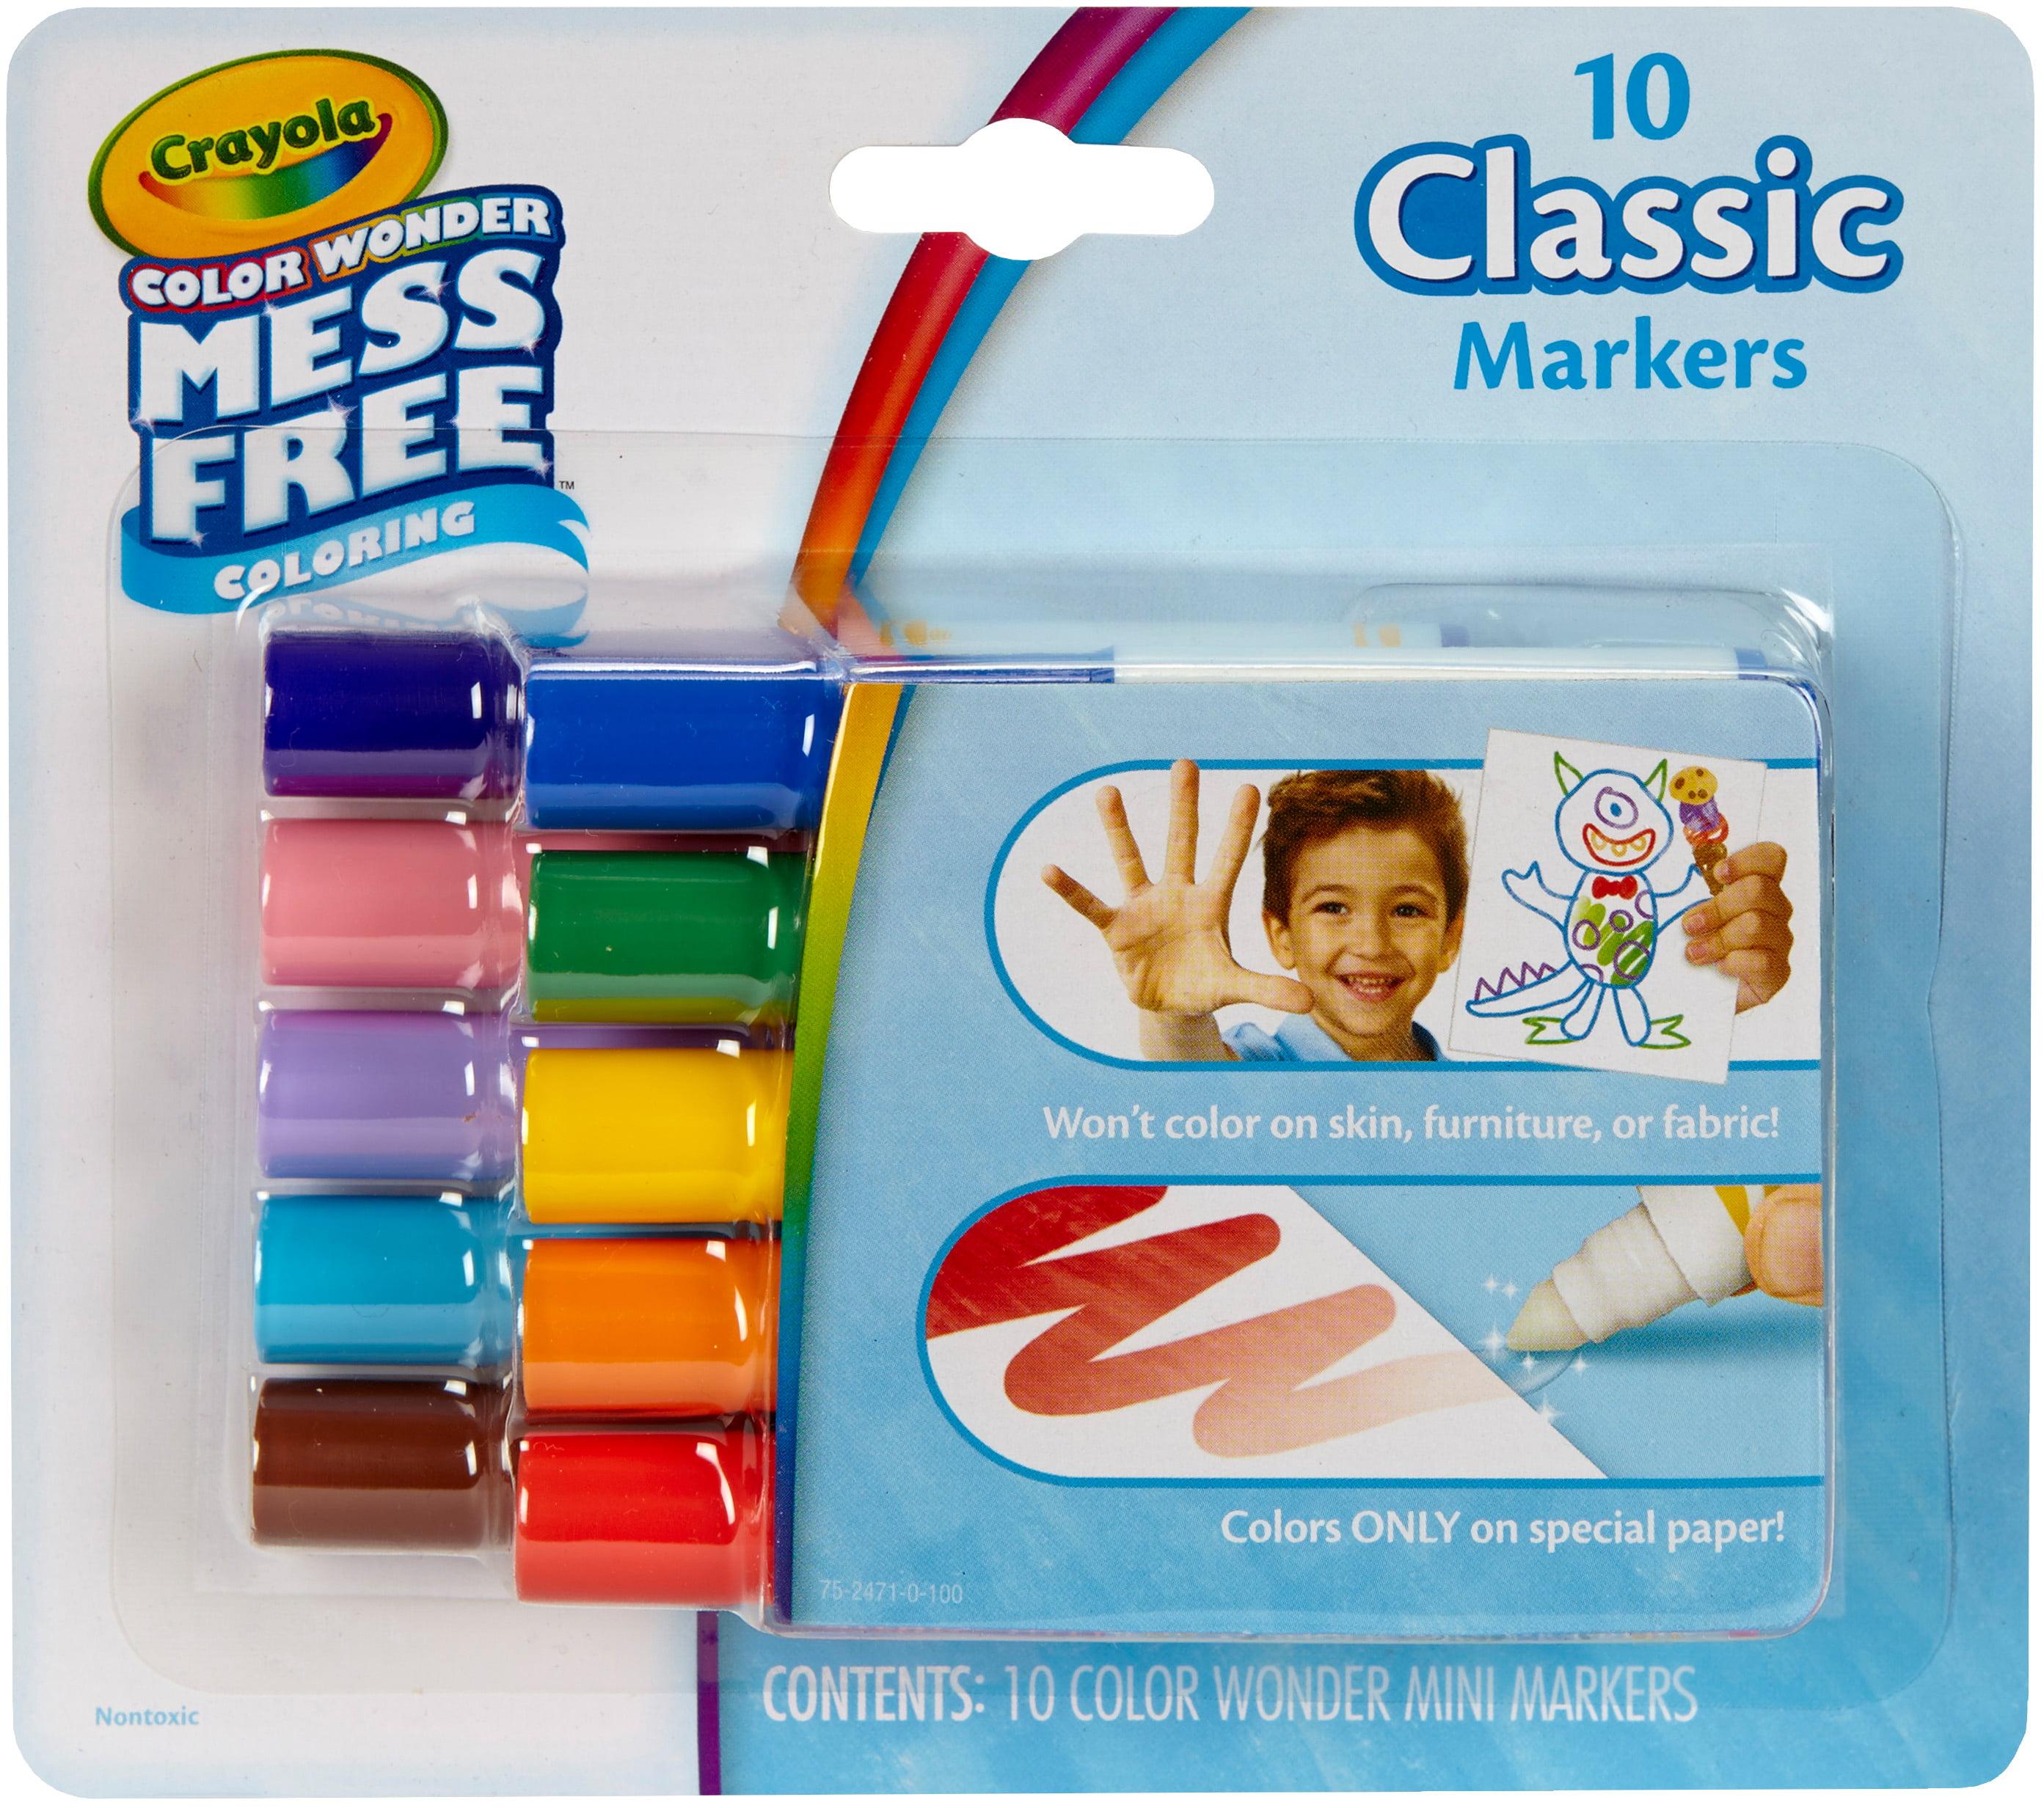 Crayola Color Wonder Mini Markers Classic by Crayola